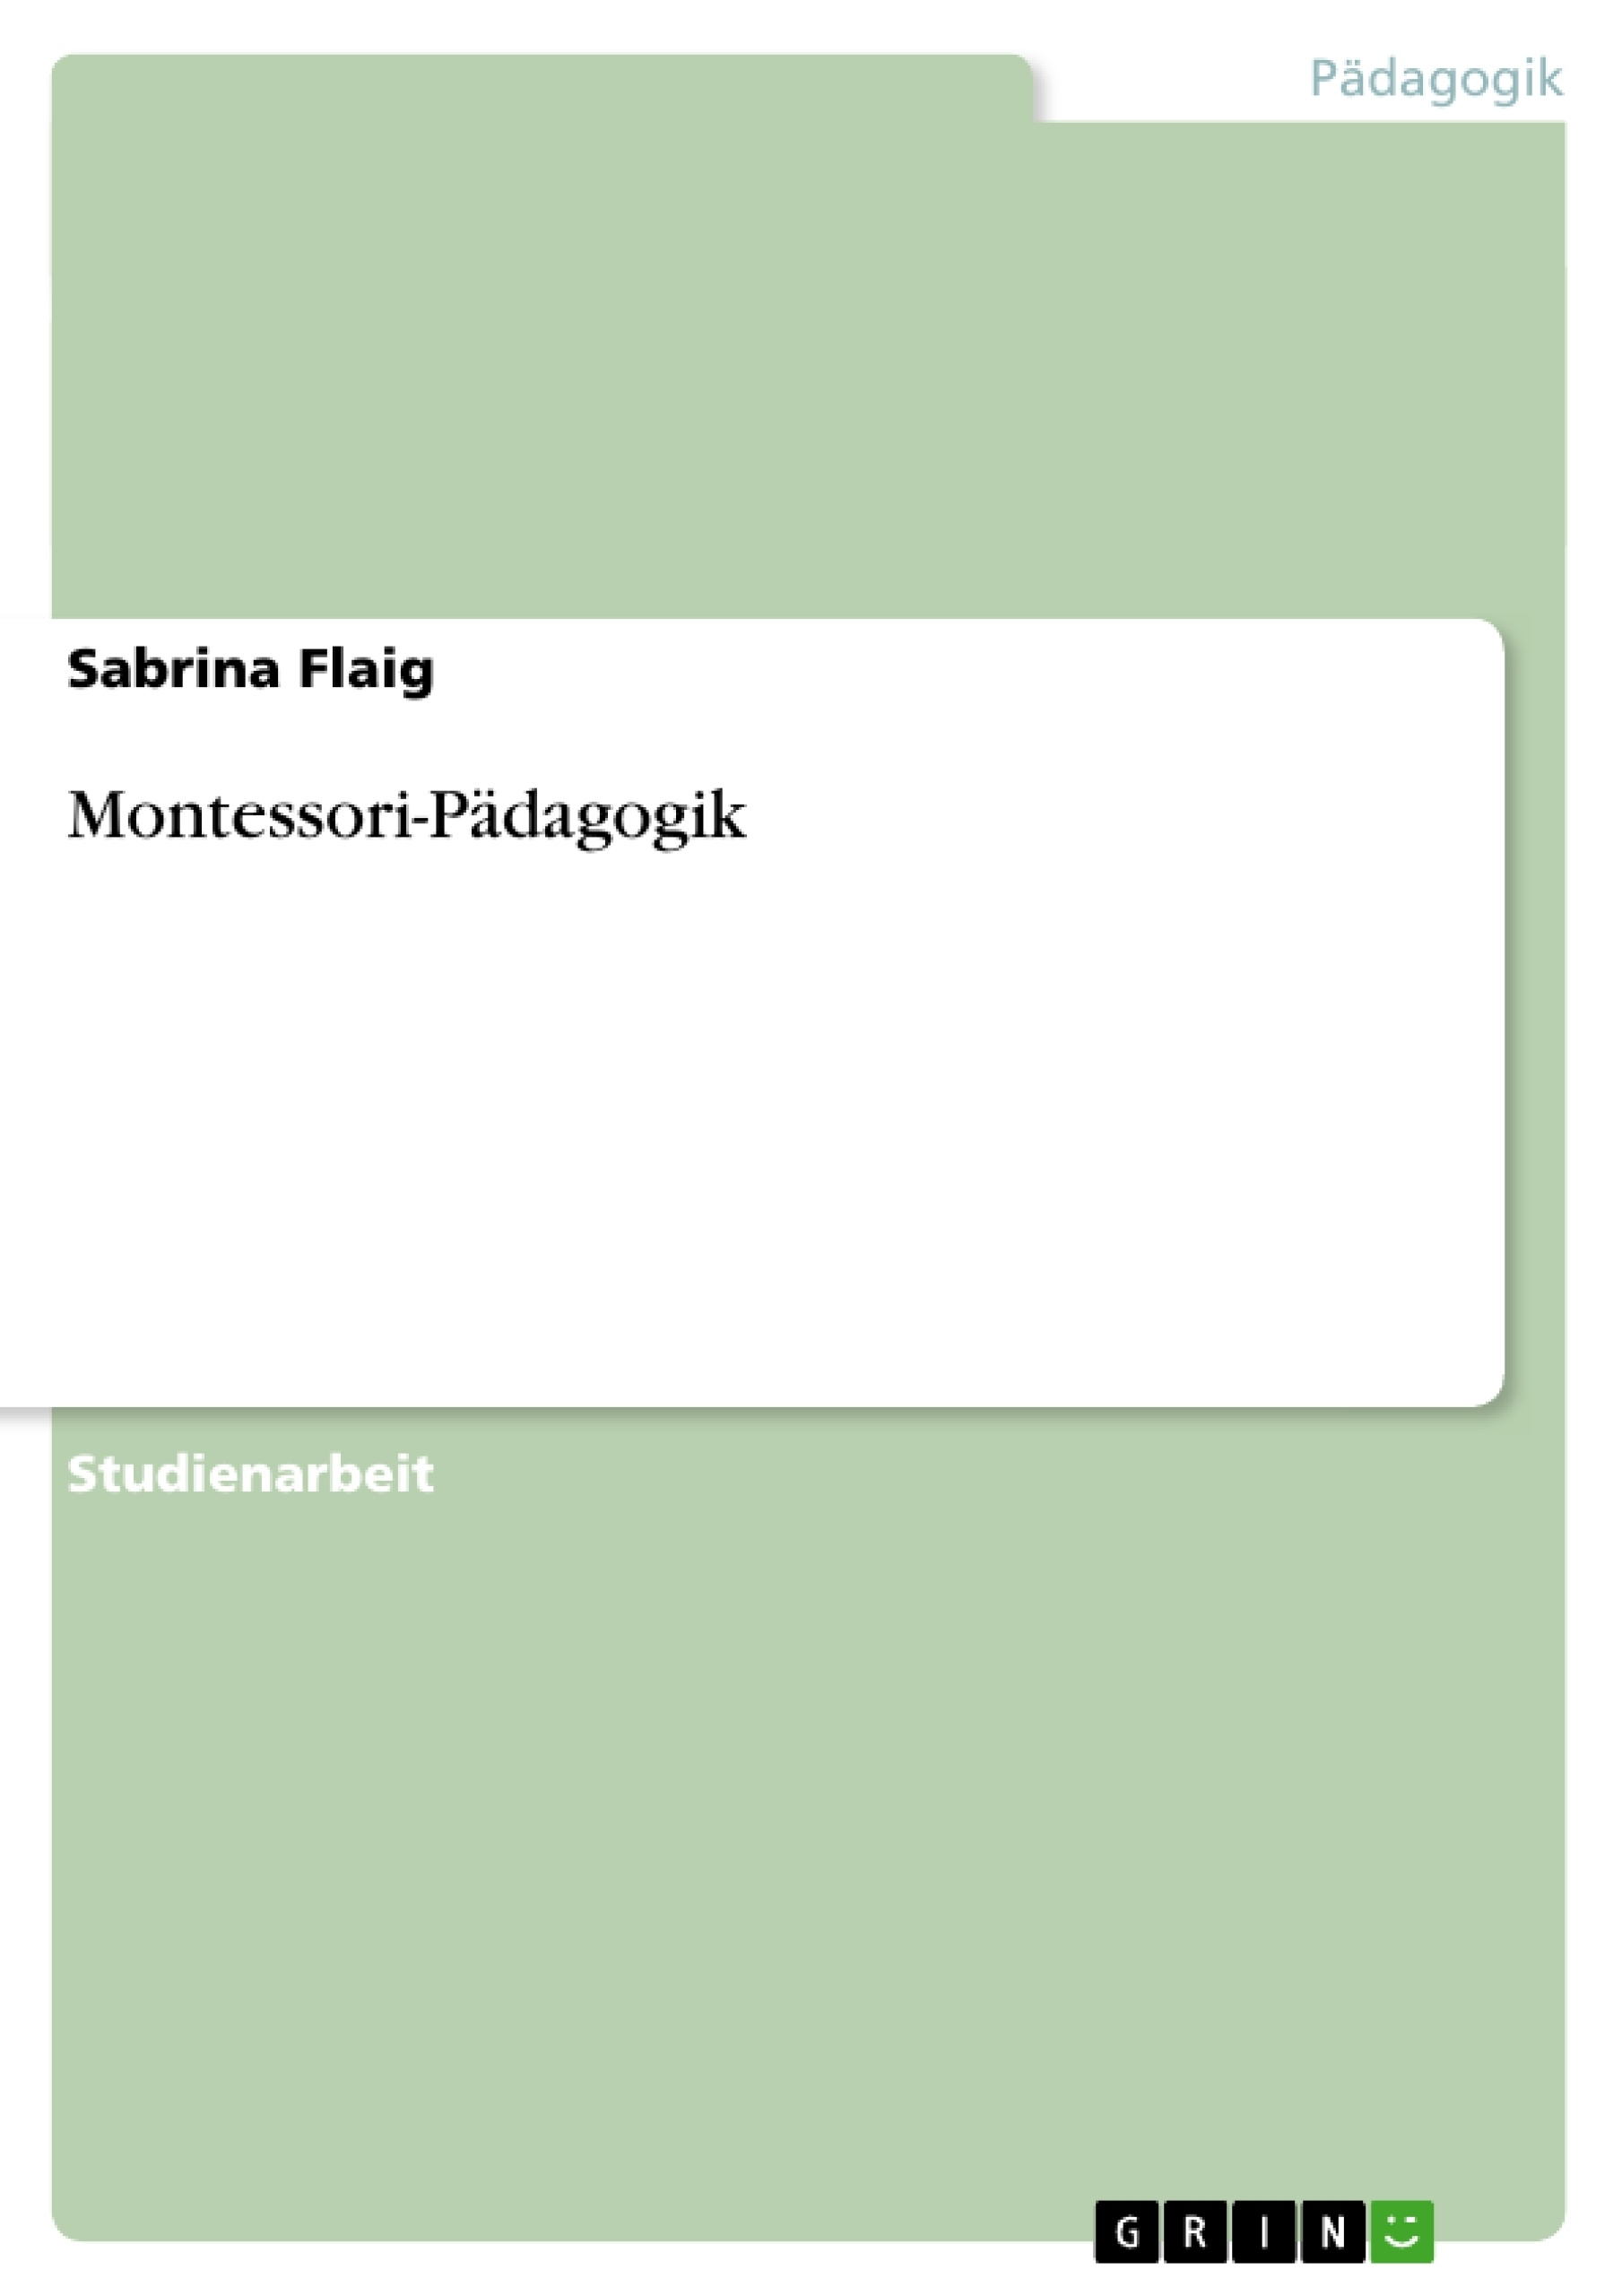 Titel: Montessori-Pädagogik